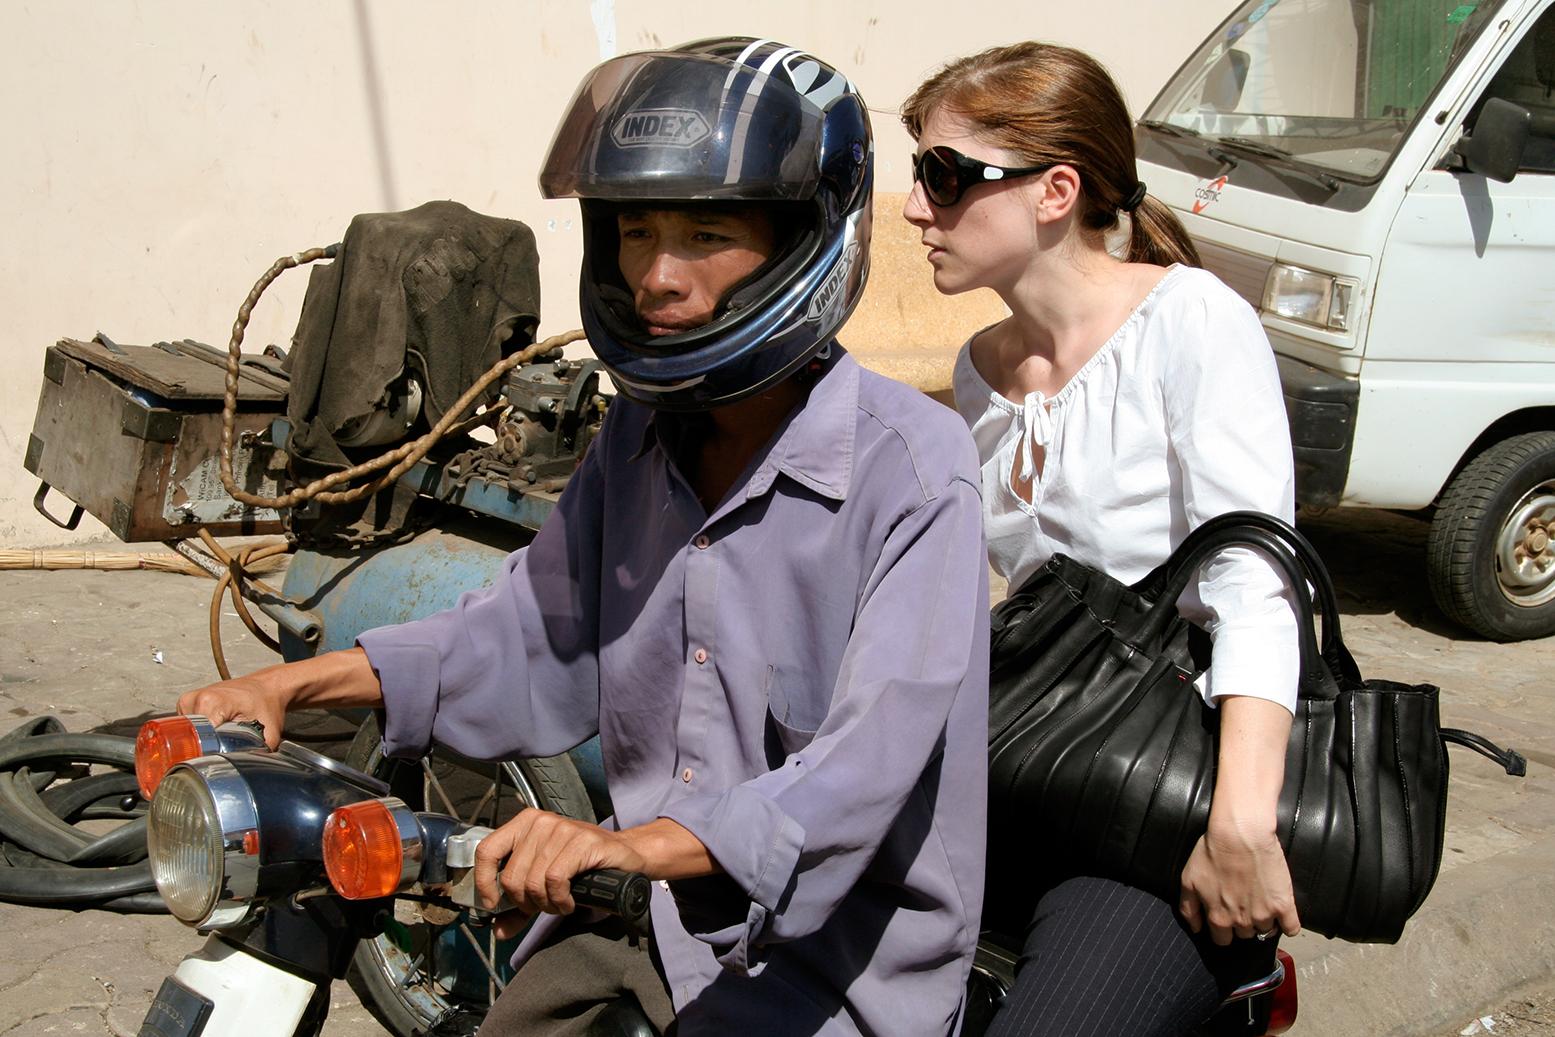 Shopping time en 'motodop'